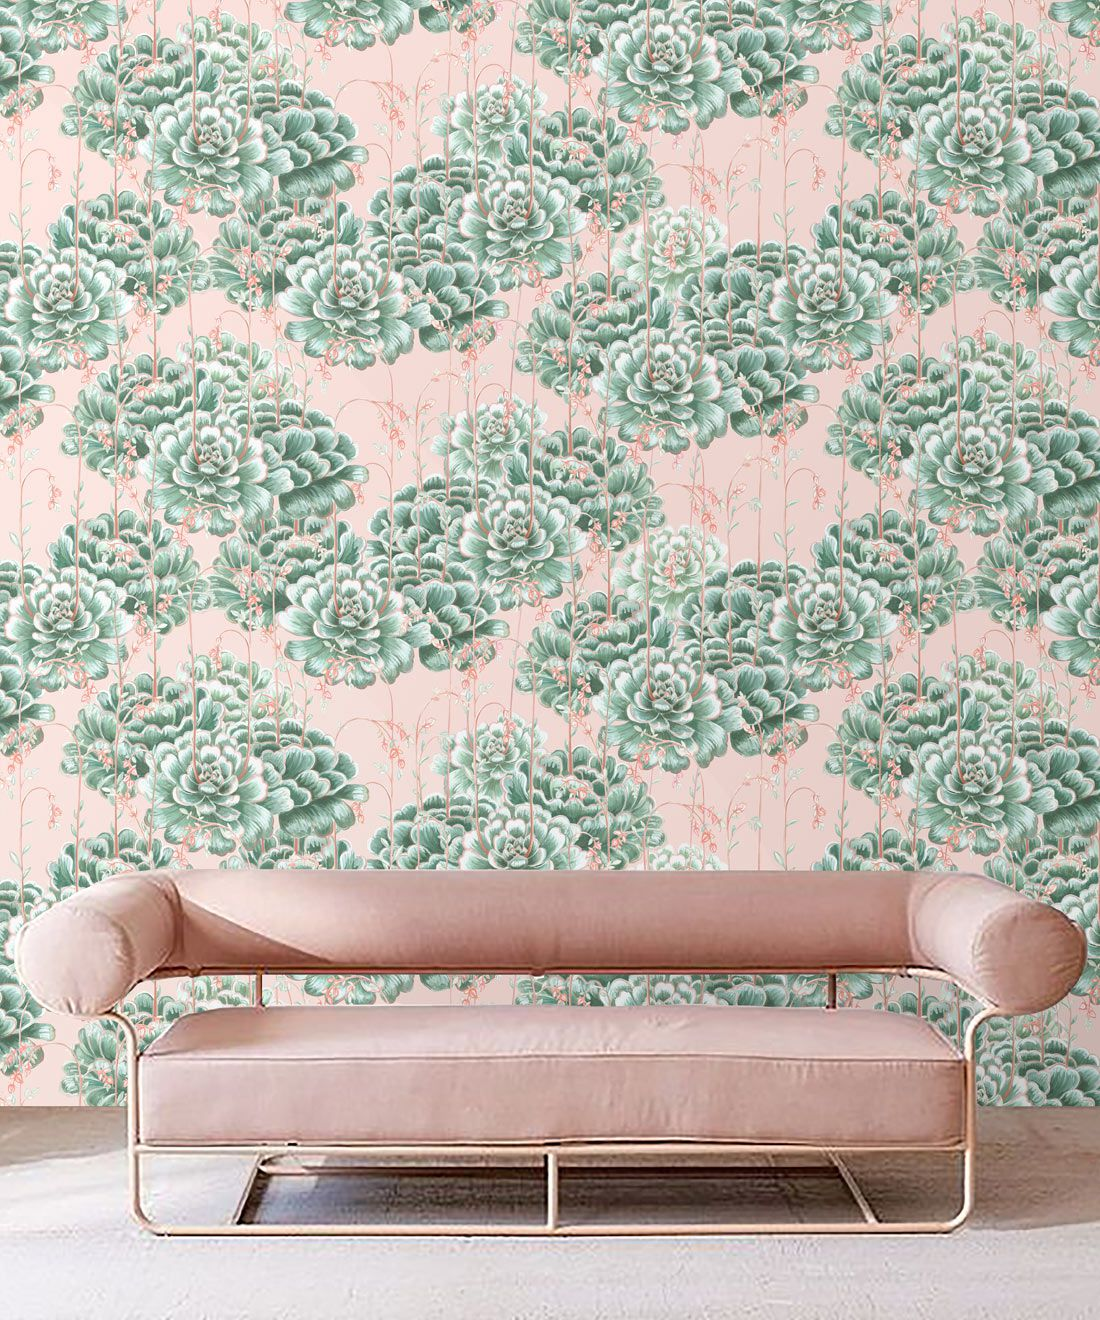 Succulents Wallpaper Green Pink • Cactus Wallpaper • Desert Wallpaper Insitu on pink background behind pink sofa